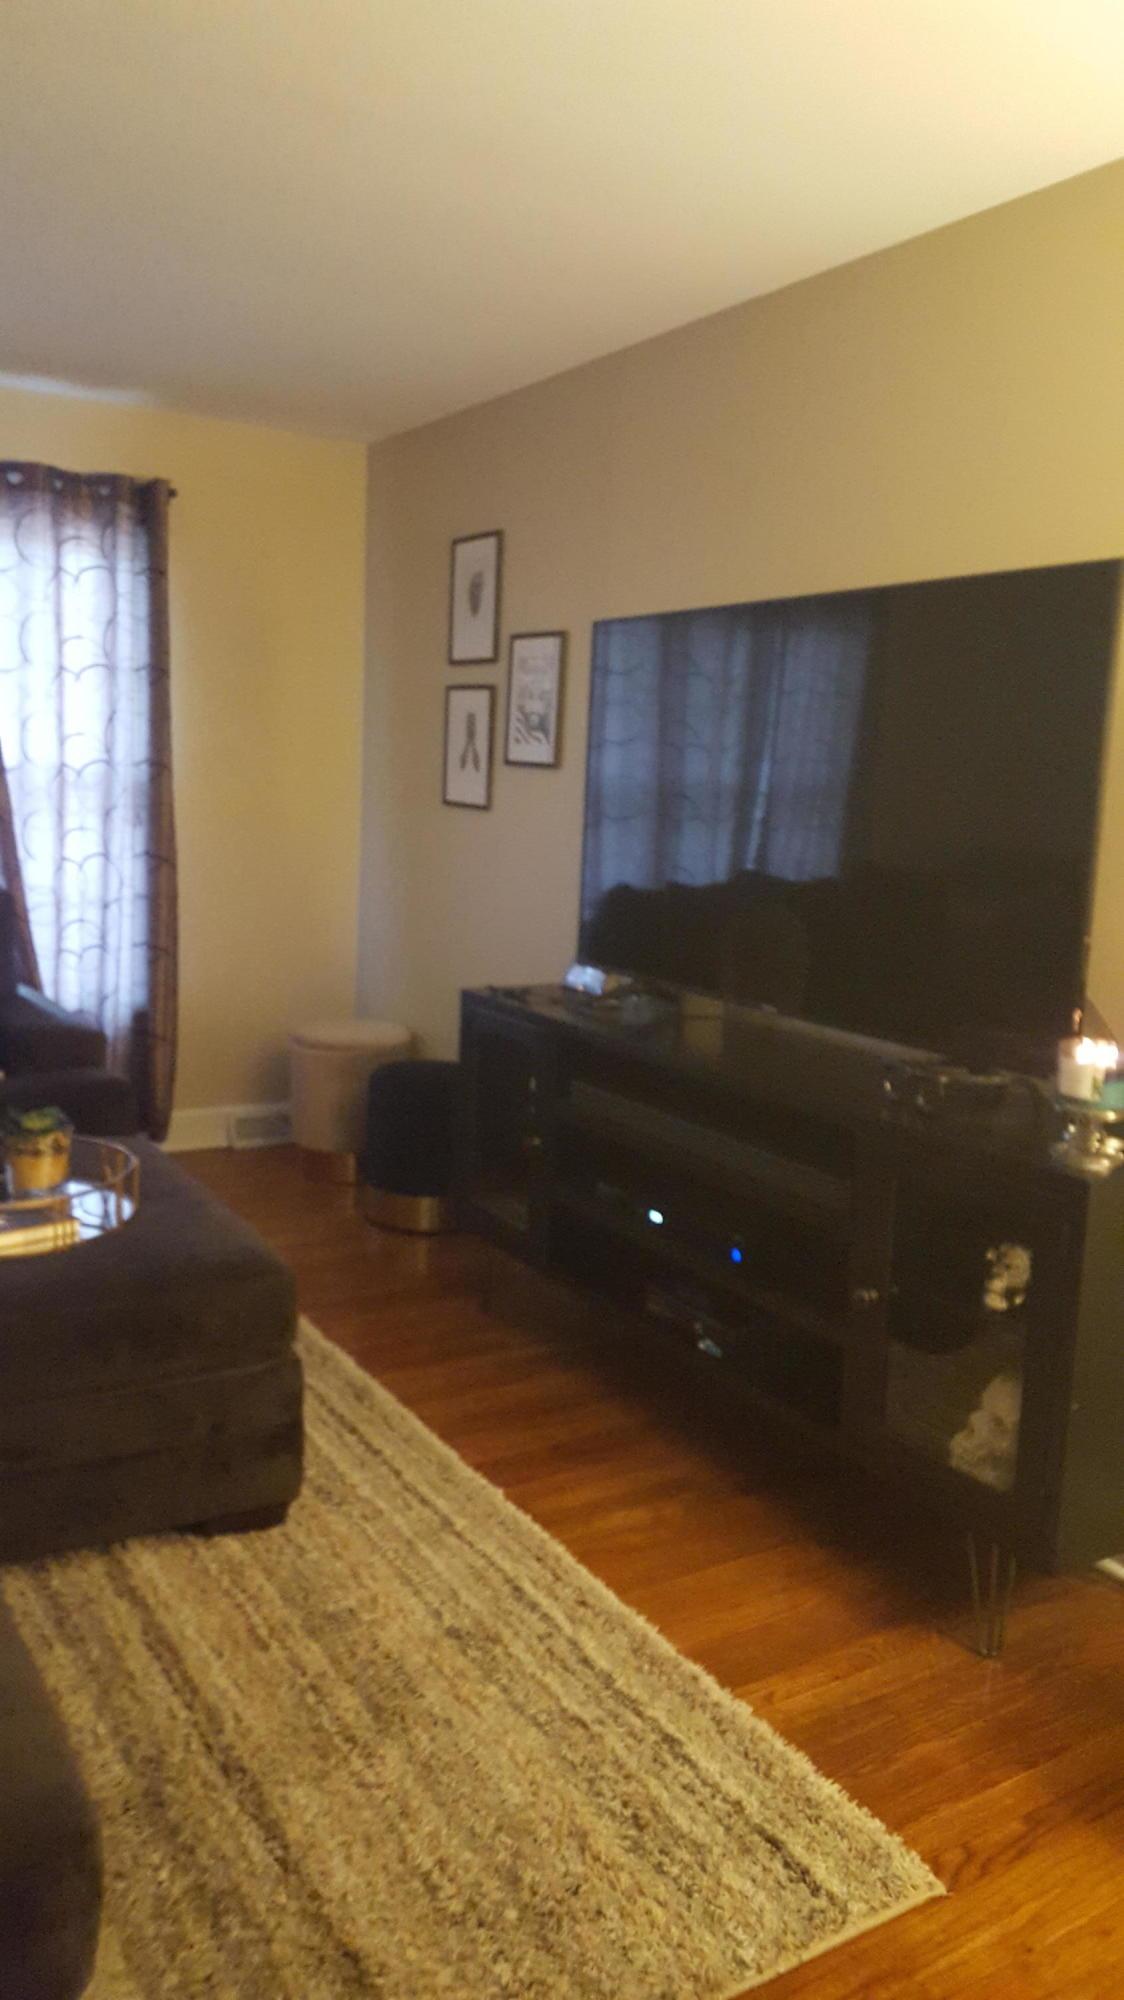 Pepperhill Homes For Sale - 7640 Hillandale, North Charleston, SC - 10